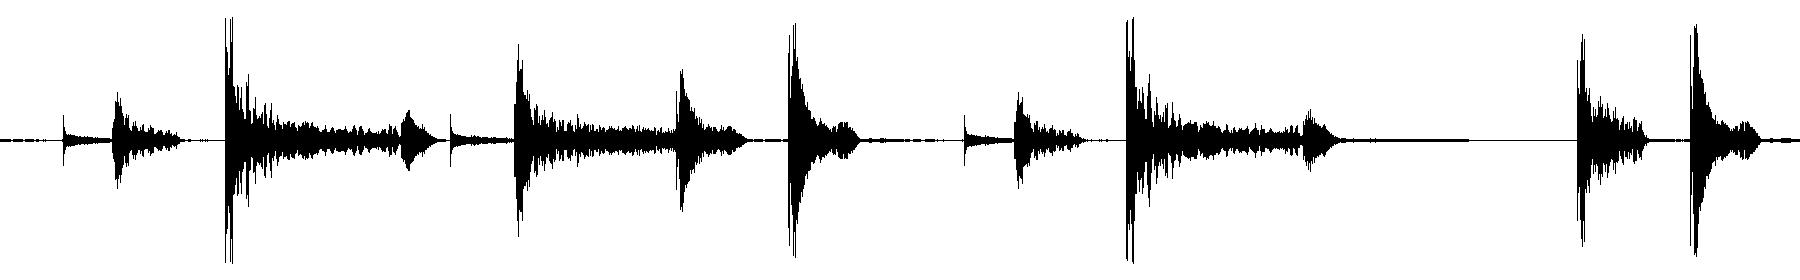 g abs05 108